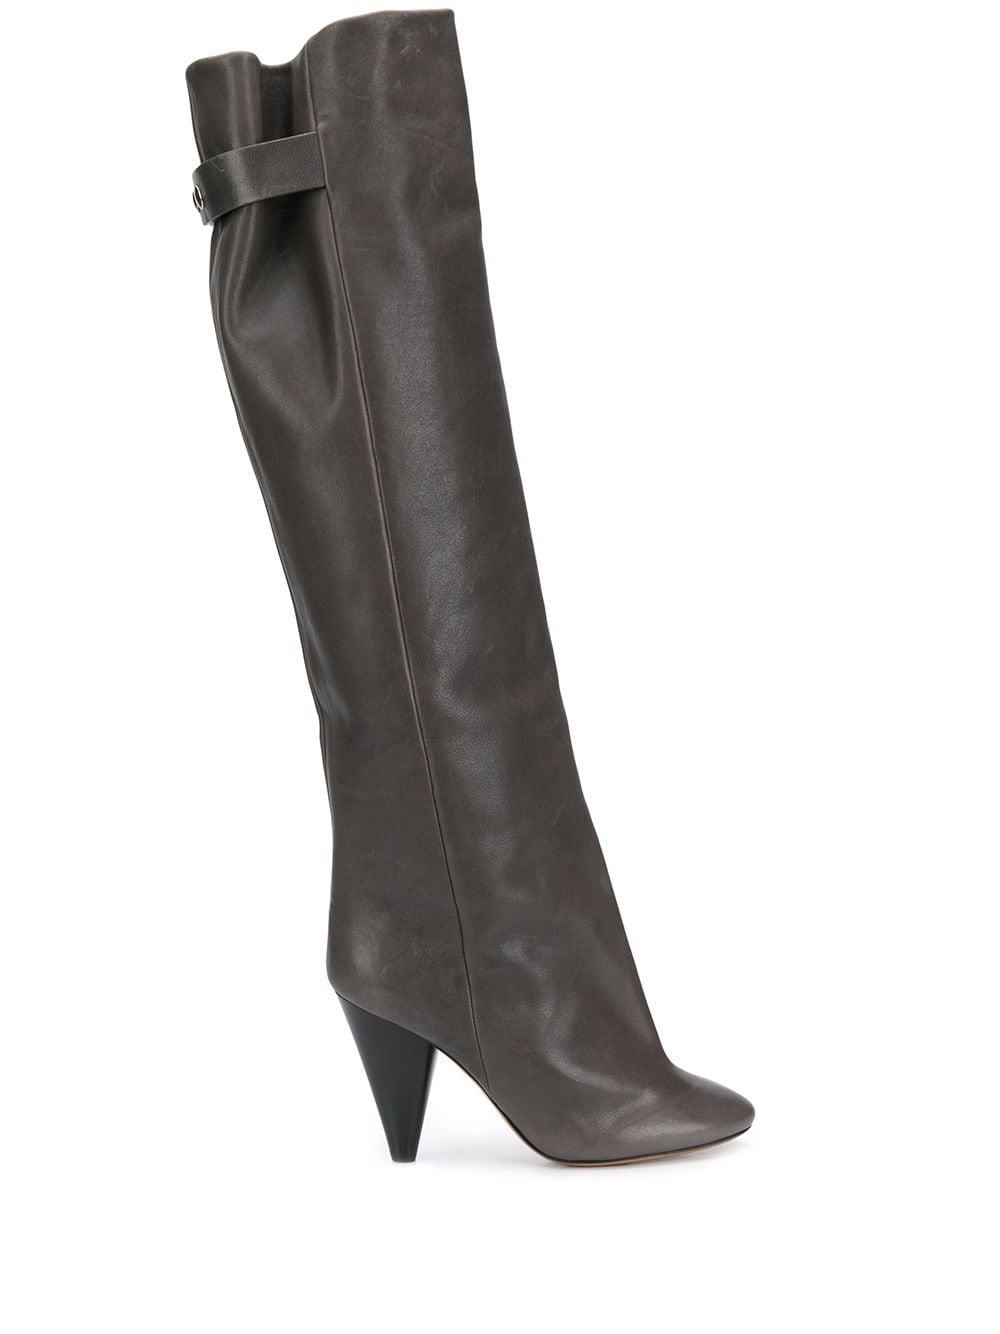 Lacine Leather Boots